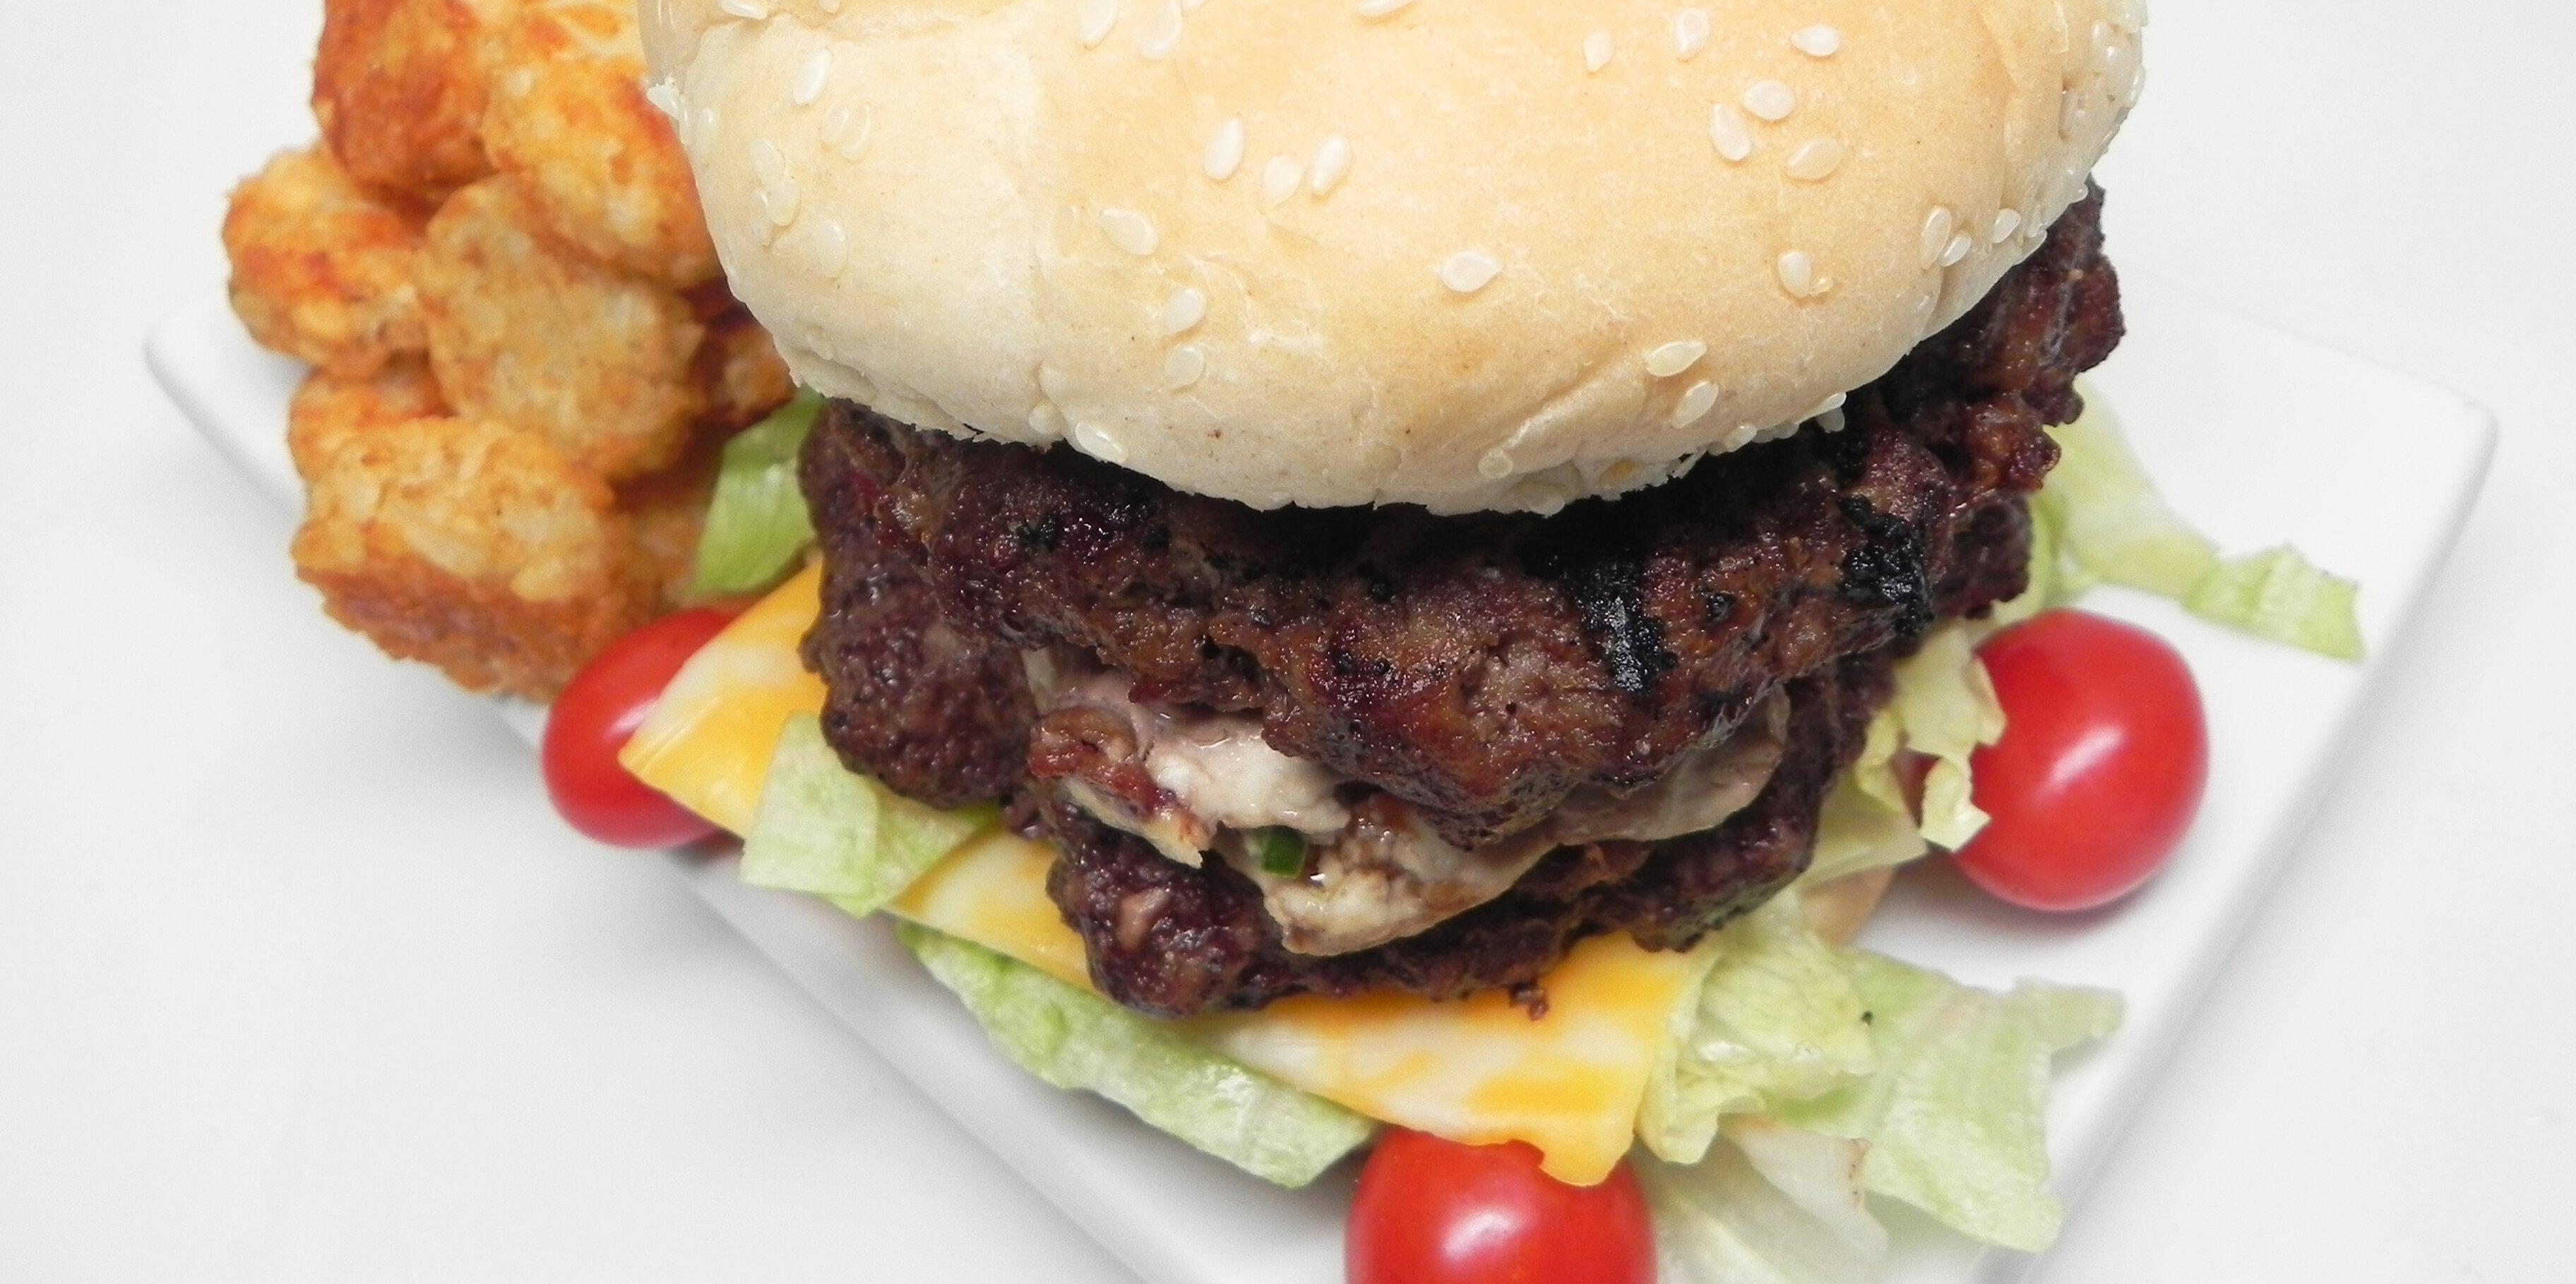 jeans bacon jalapeno cream cheese stuffed burgers recipe